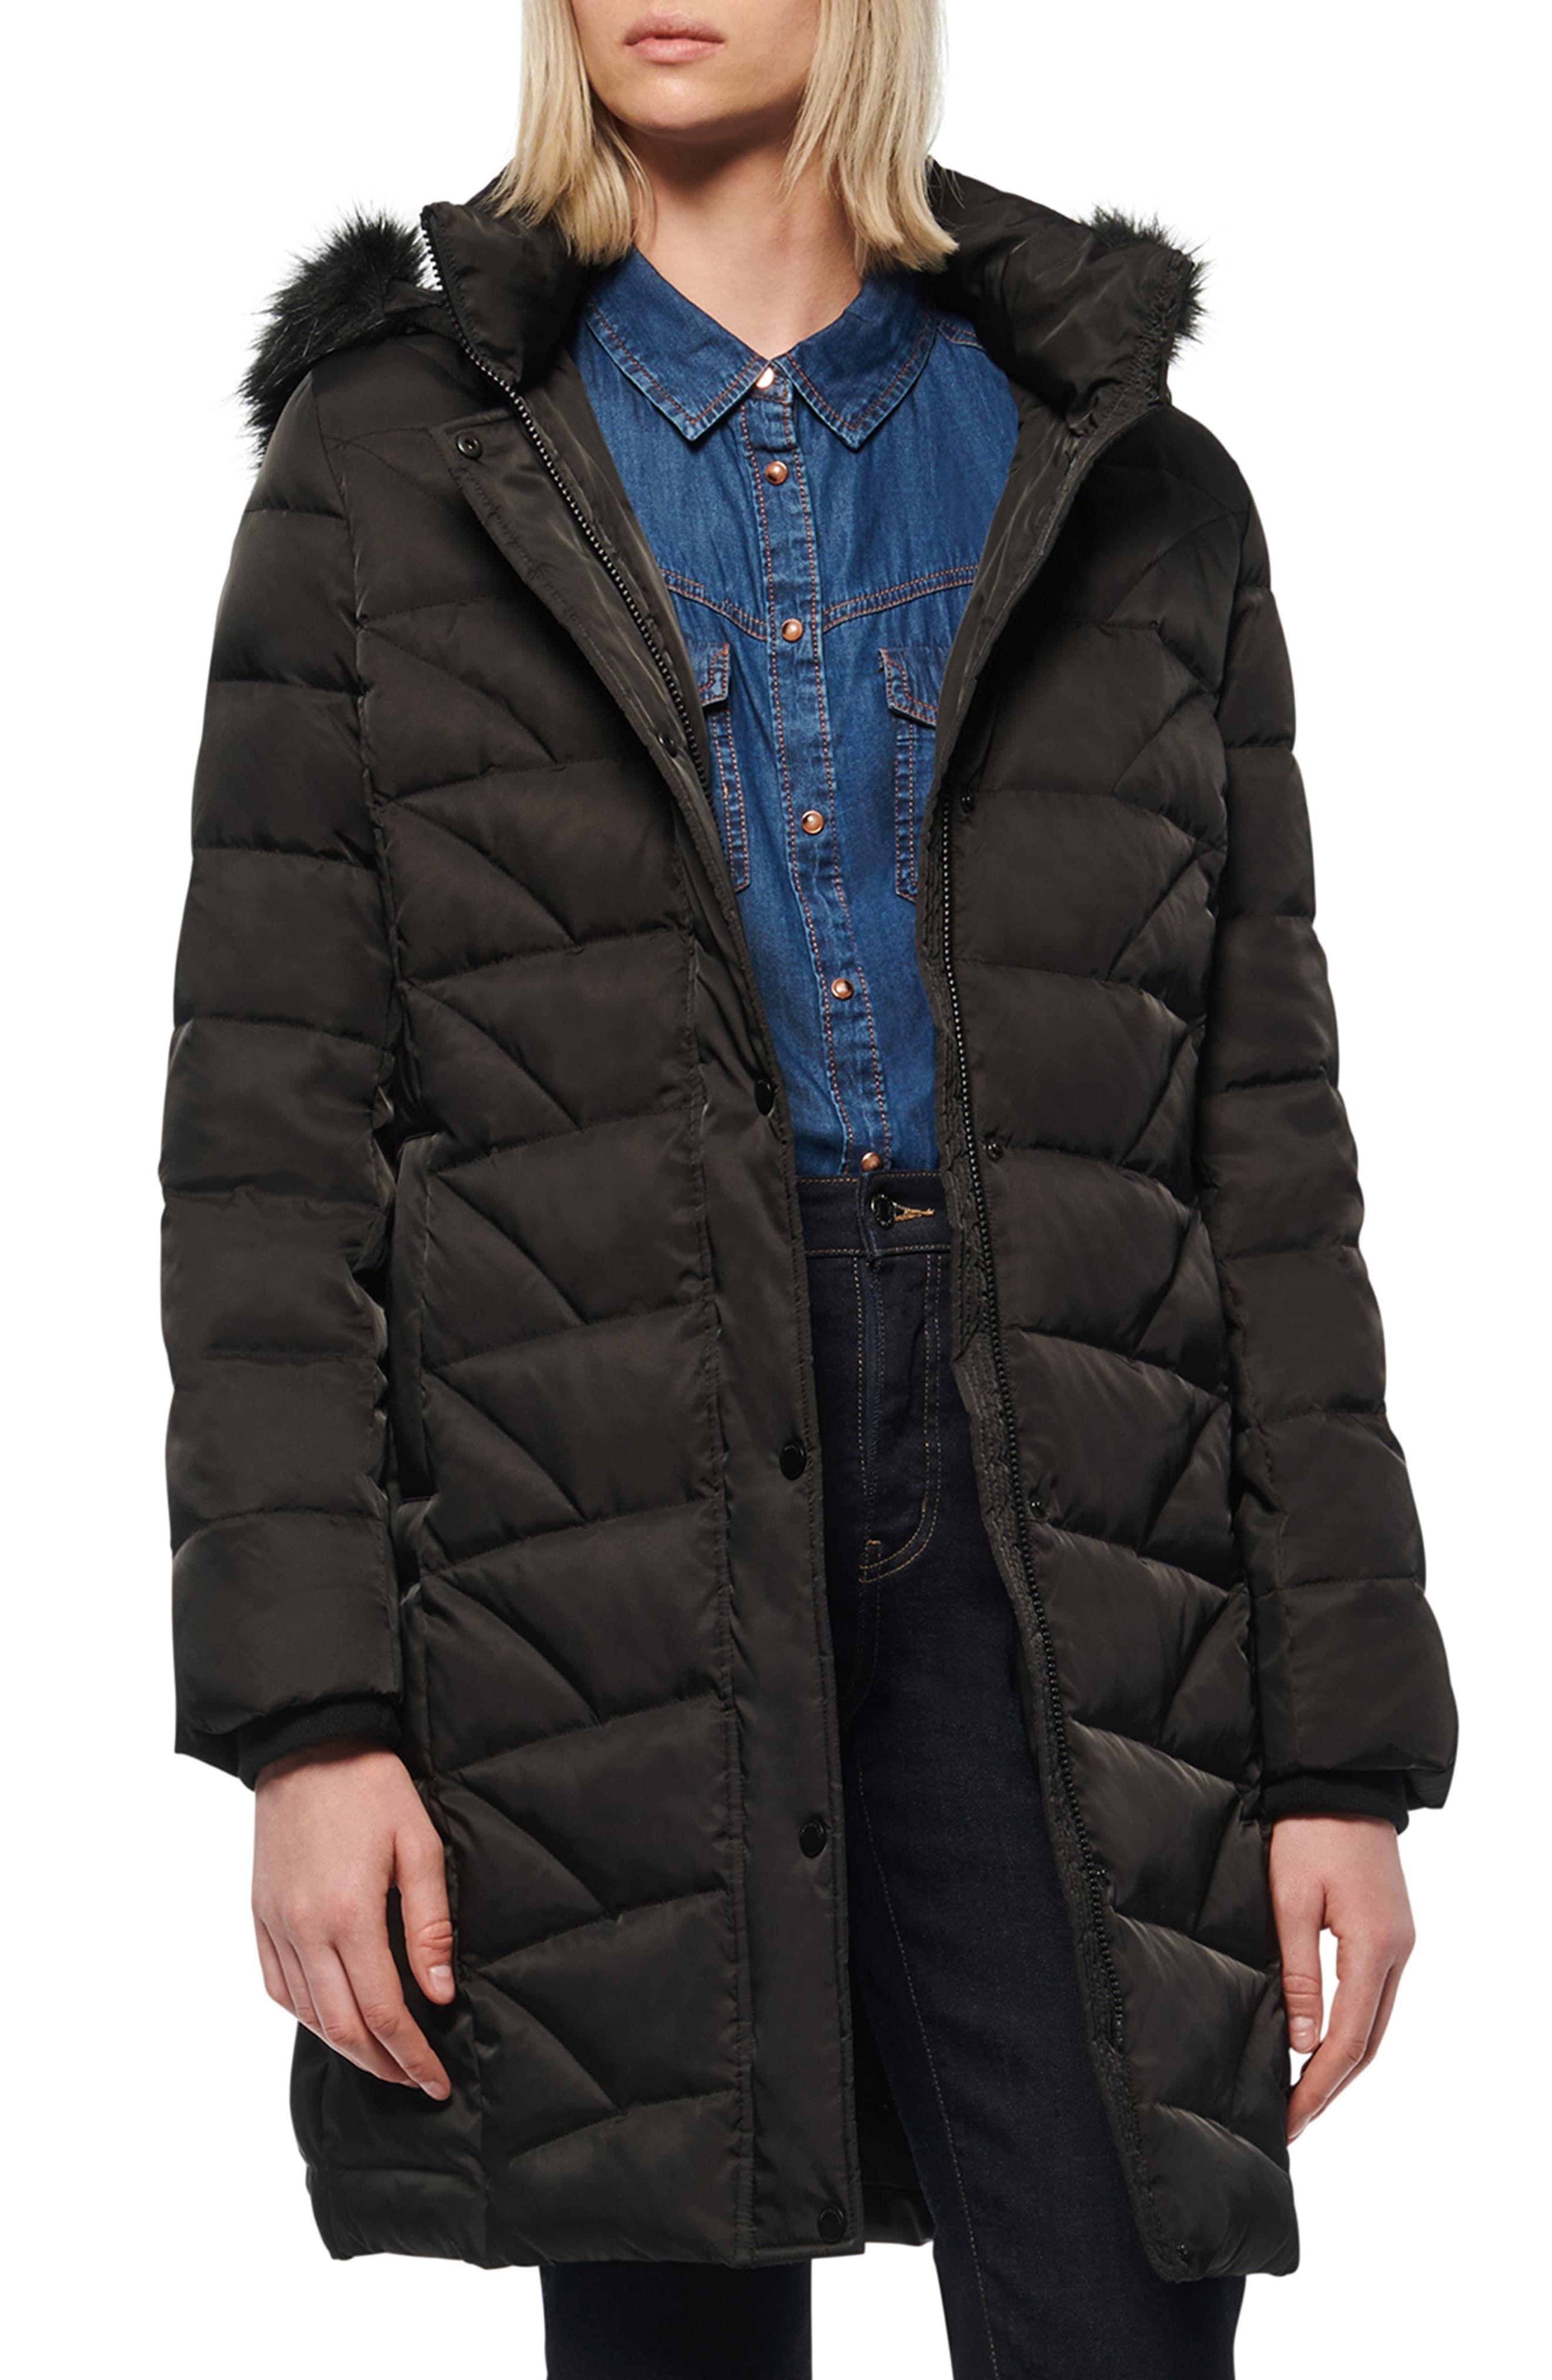 Women S Marc New York Medina Faux Fur Trim Down Puffer Jacket Size Medium Black Women S Puffer Coats Puffer Jacket Women Puffer Jacket Black [ 4048 x 2640 Pixel ]